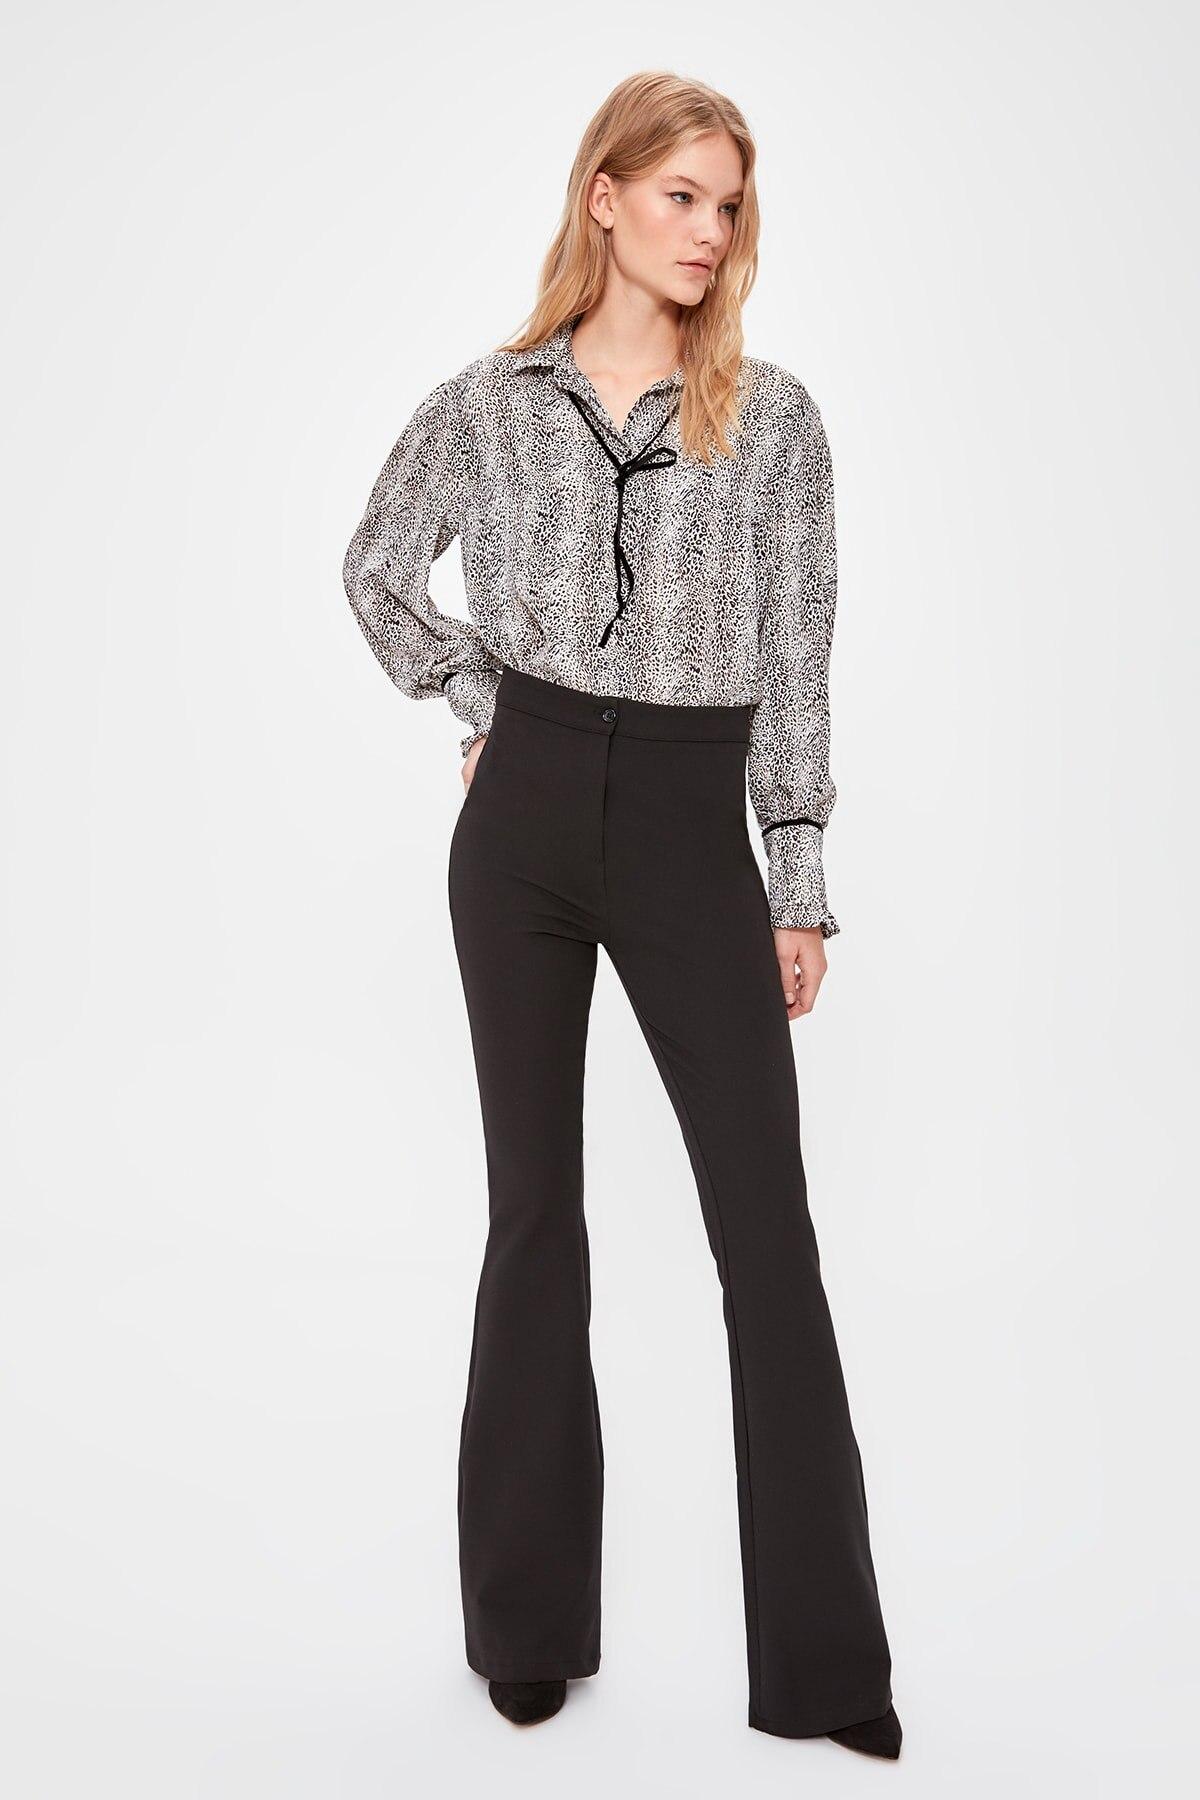 Trendyol Spanish Bell-Bottomed Pants TWOAW20PL0576